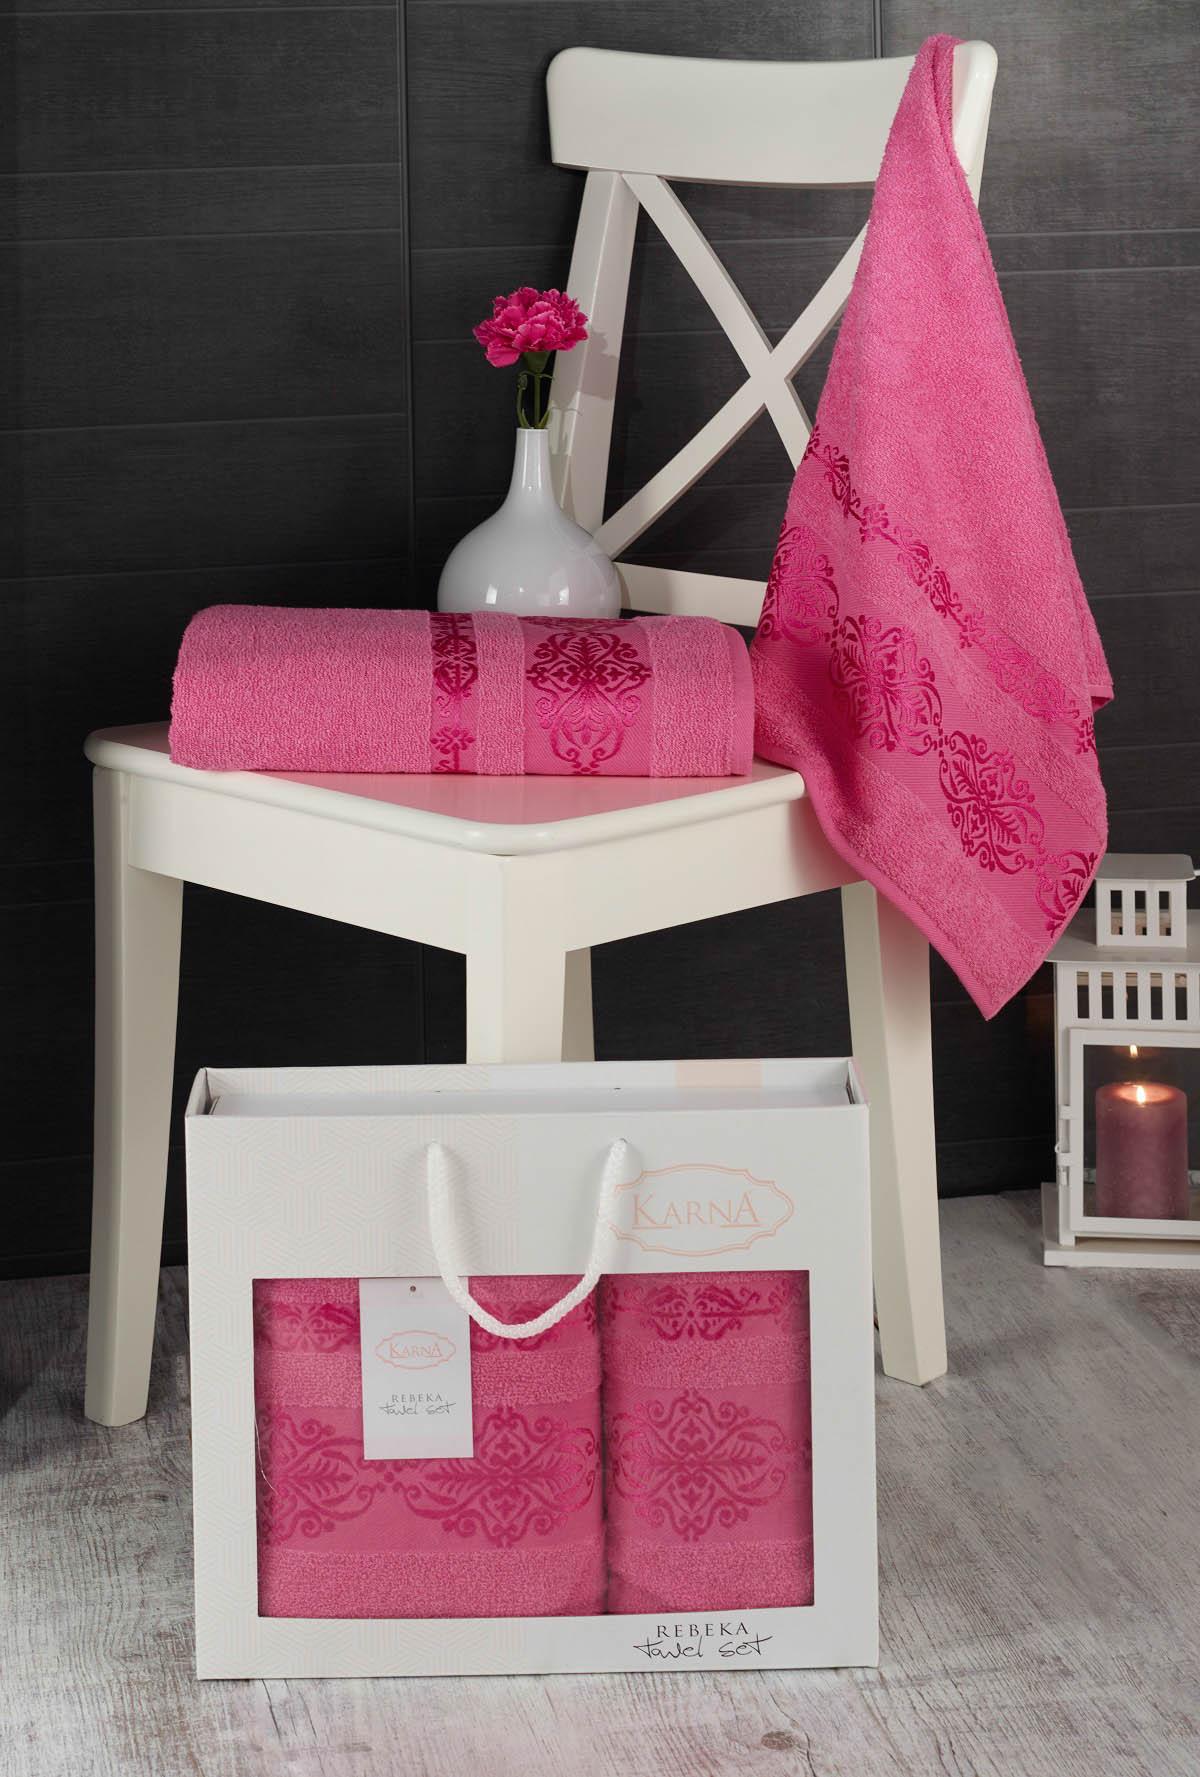 Полотенца Karna Полотенце Rebeca Цвет: Розовый (50х90 см,70х140 см) наматрасник karna с пропиткой 120x200 см